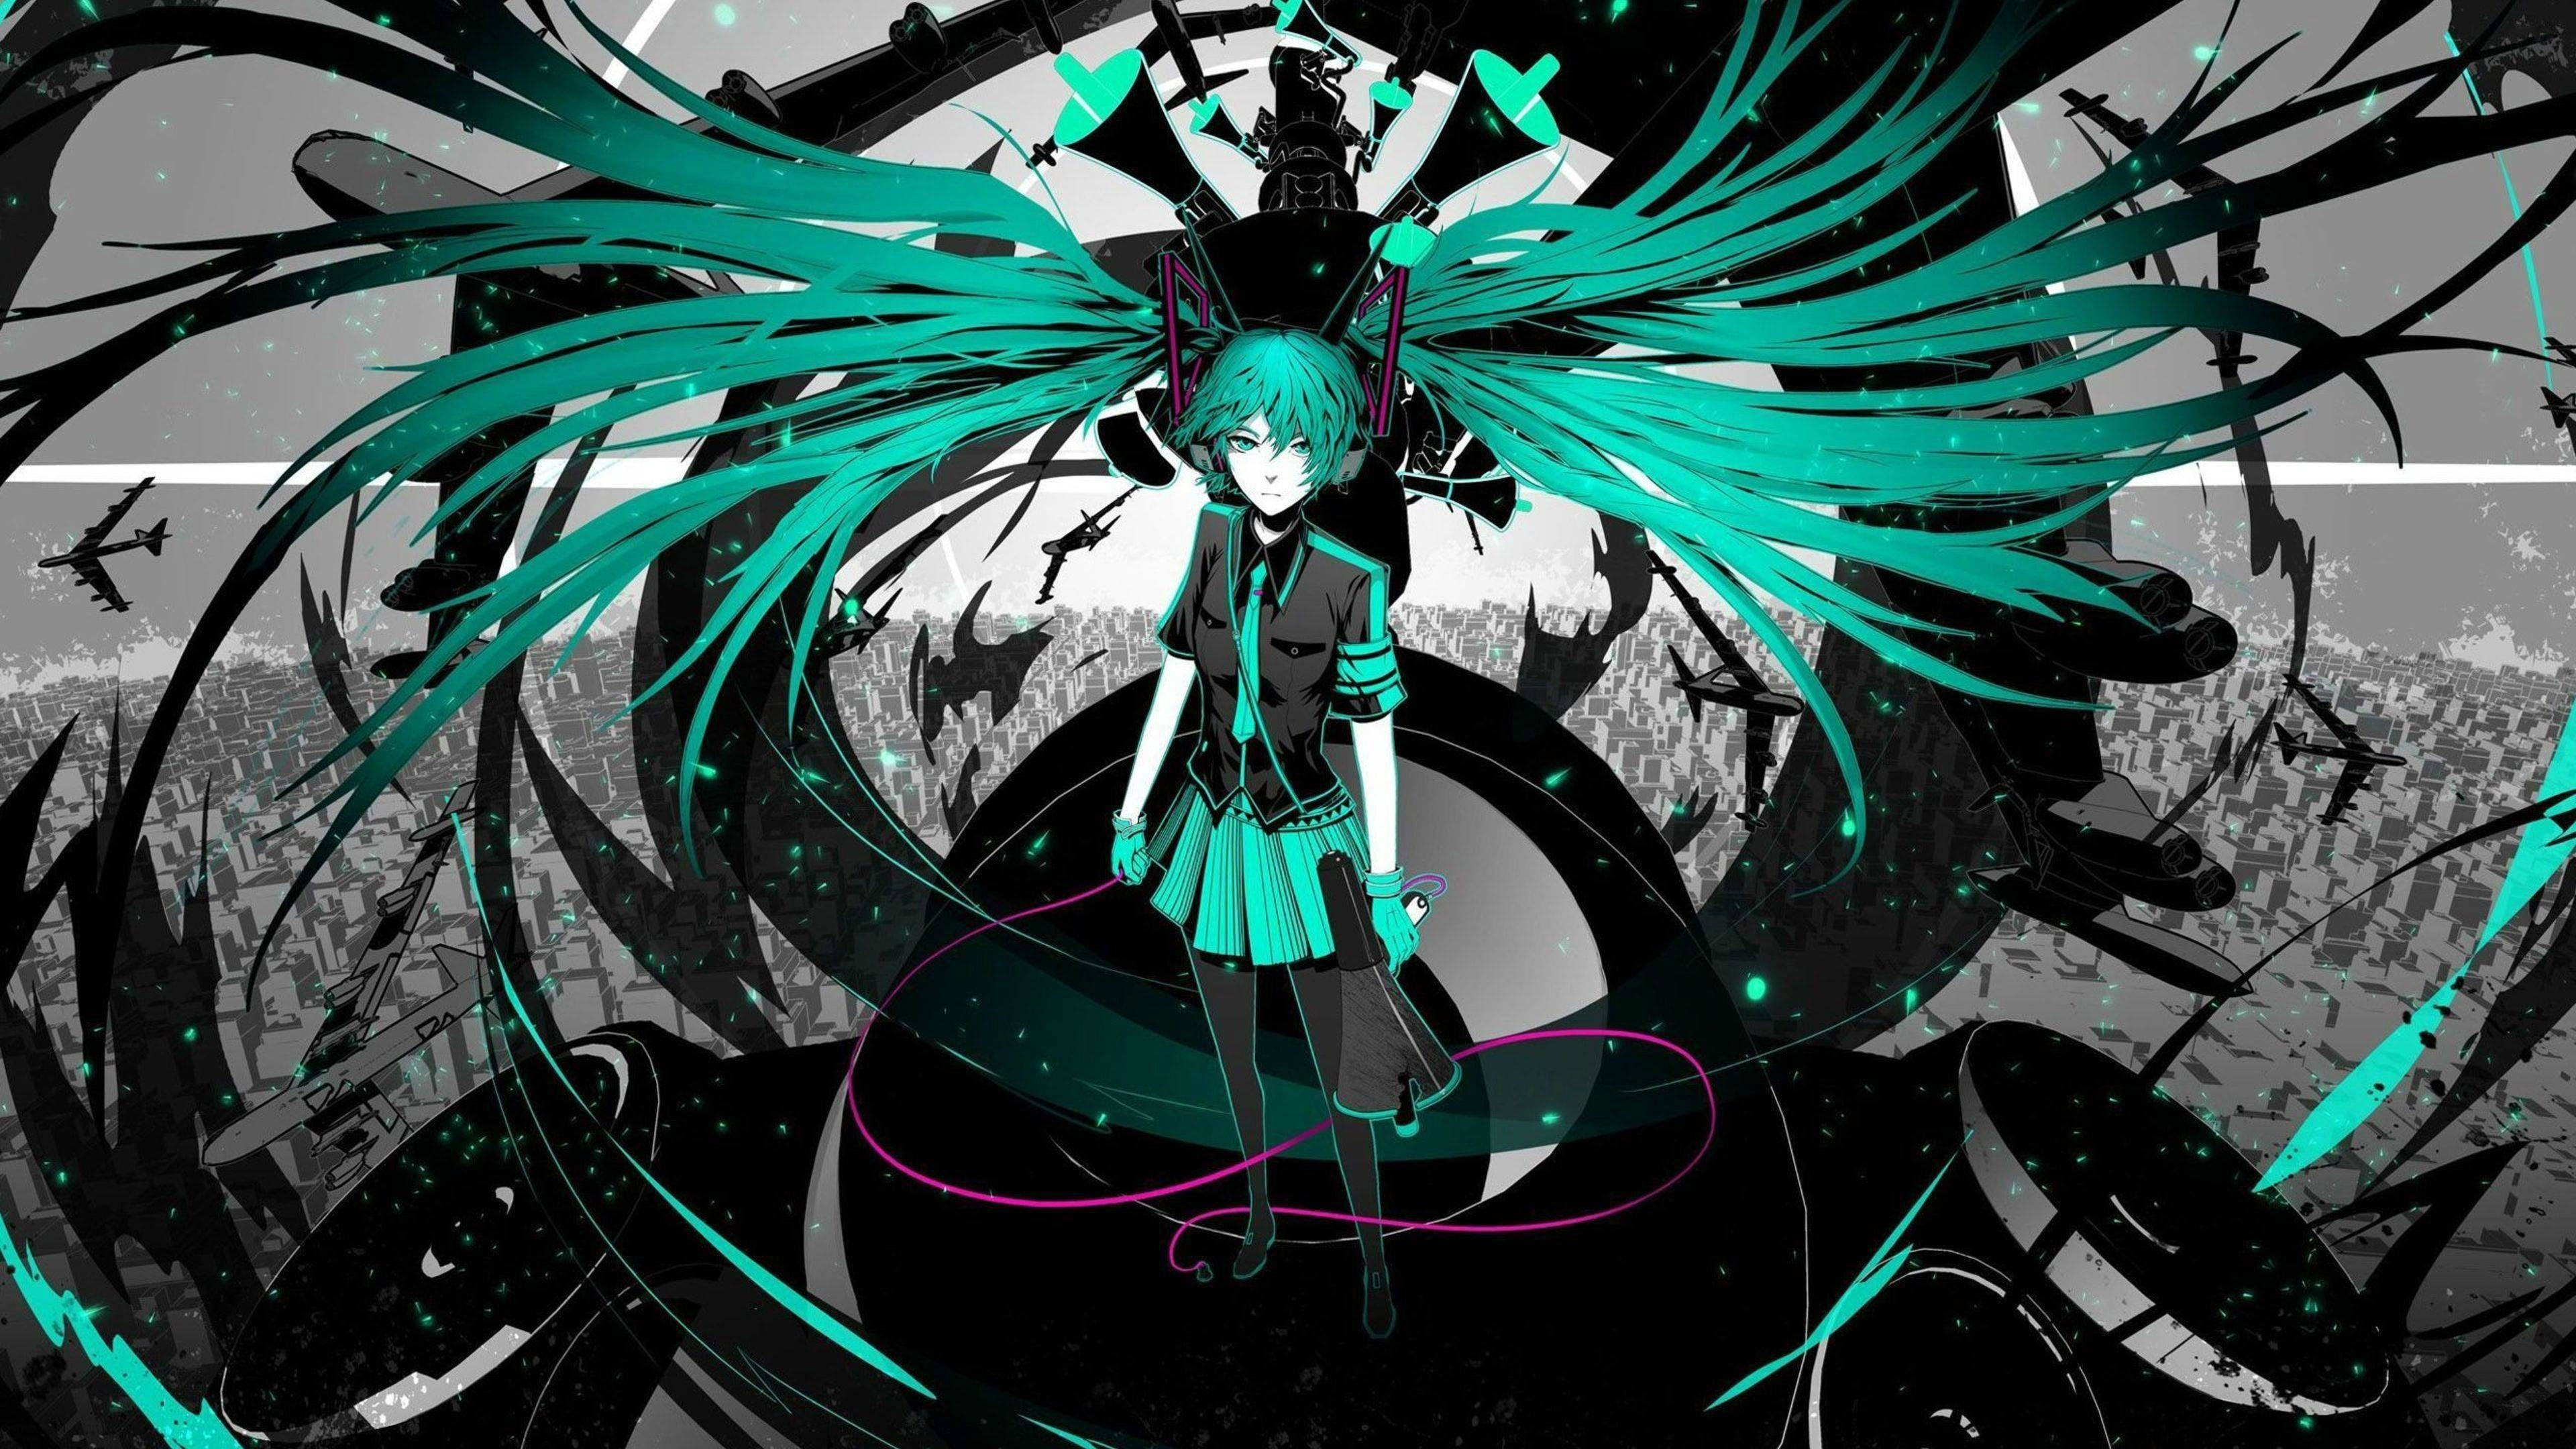 7000 Wallpaper Anime Hd 4k Android HD Gratis